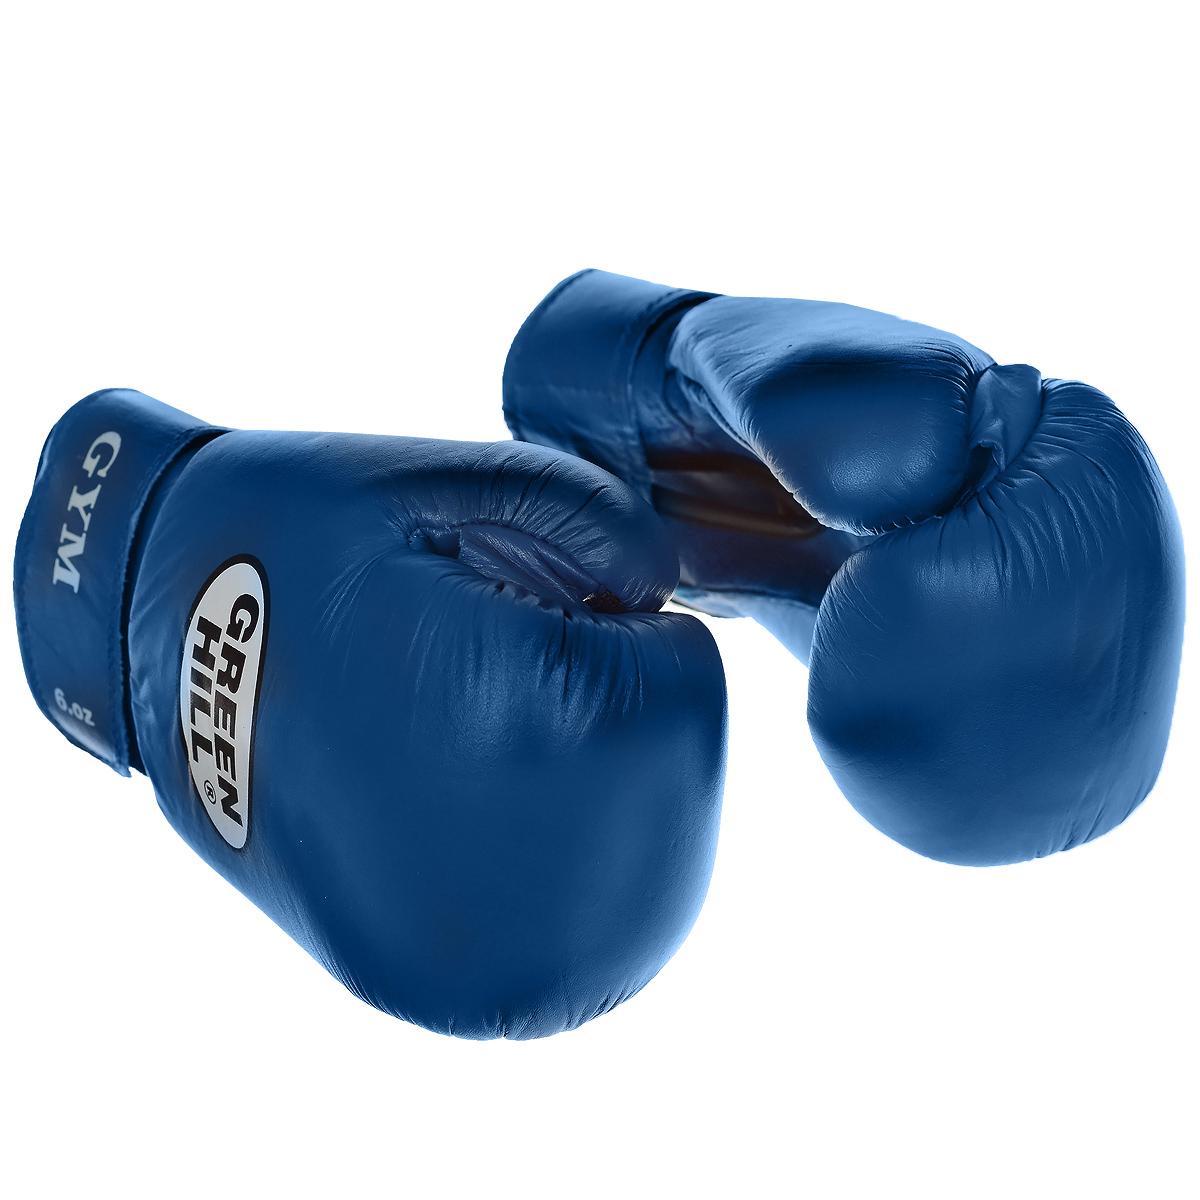 Перчатки боксерские Green Hill Gym, цвет: синий. Вес 8 унций